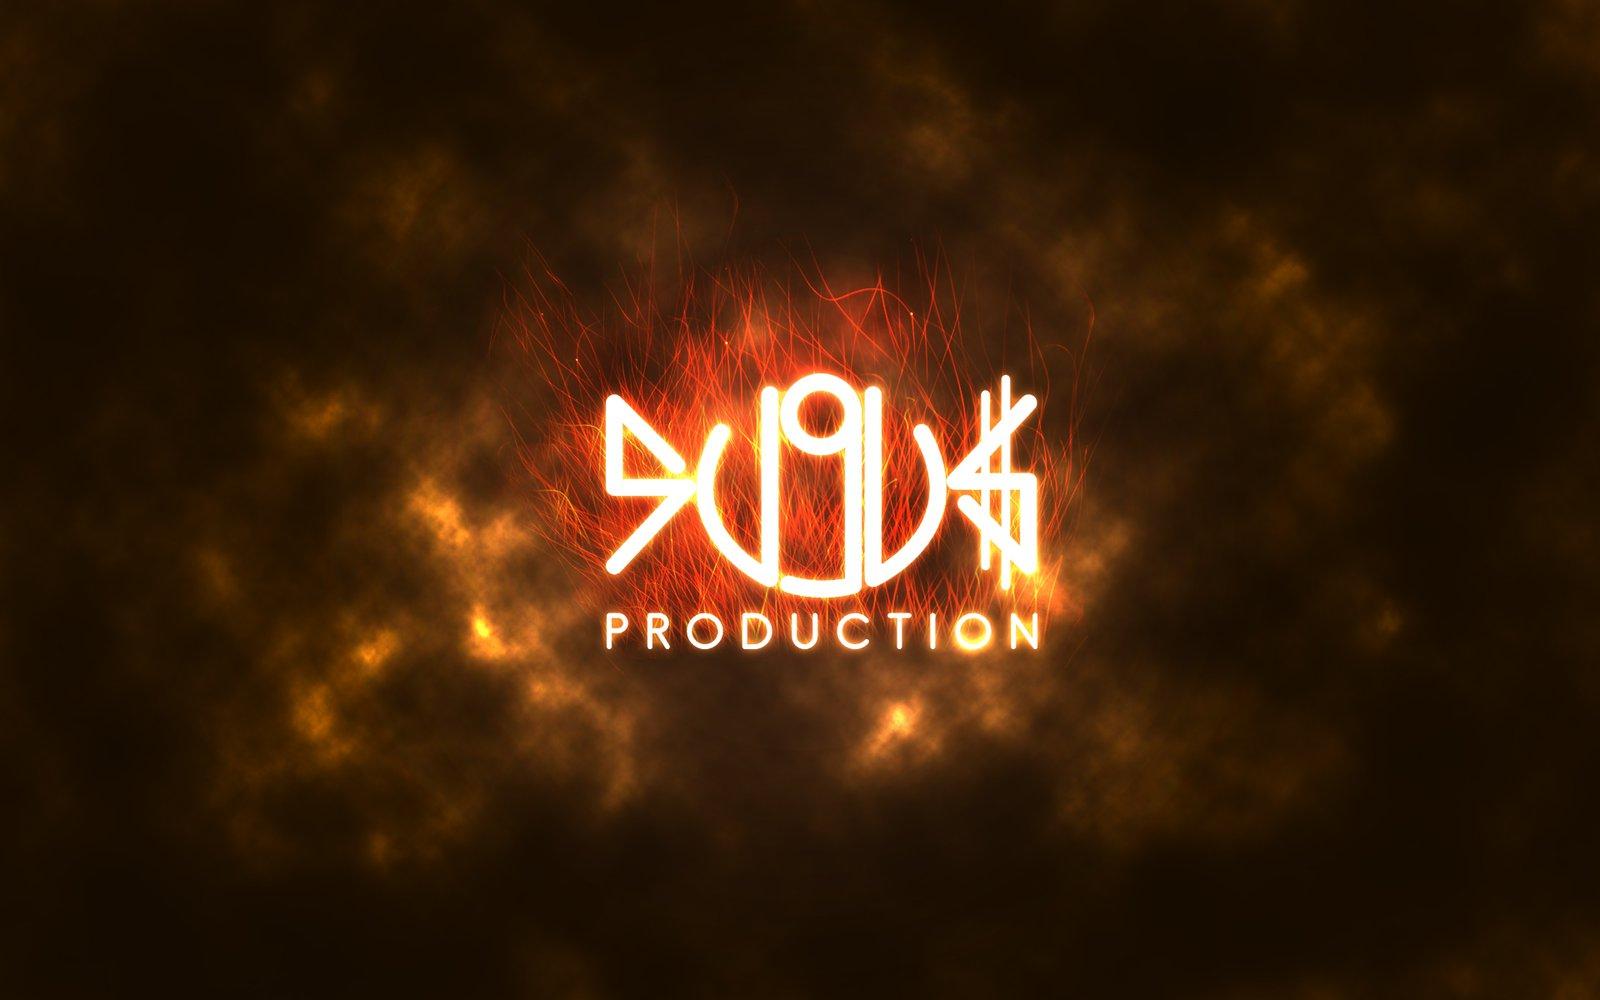 S.u.9.u.$ Production